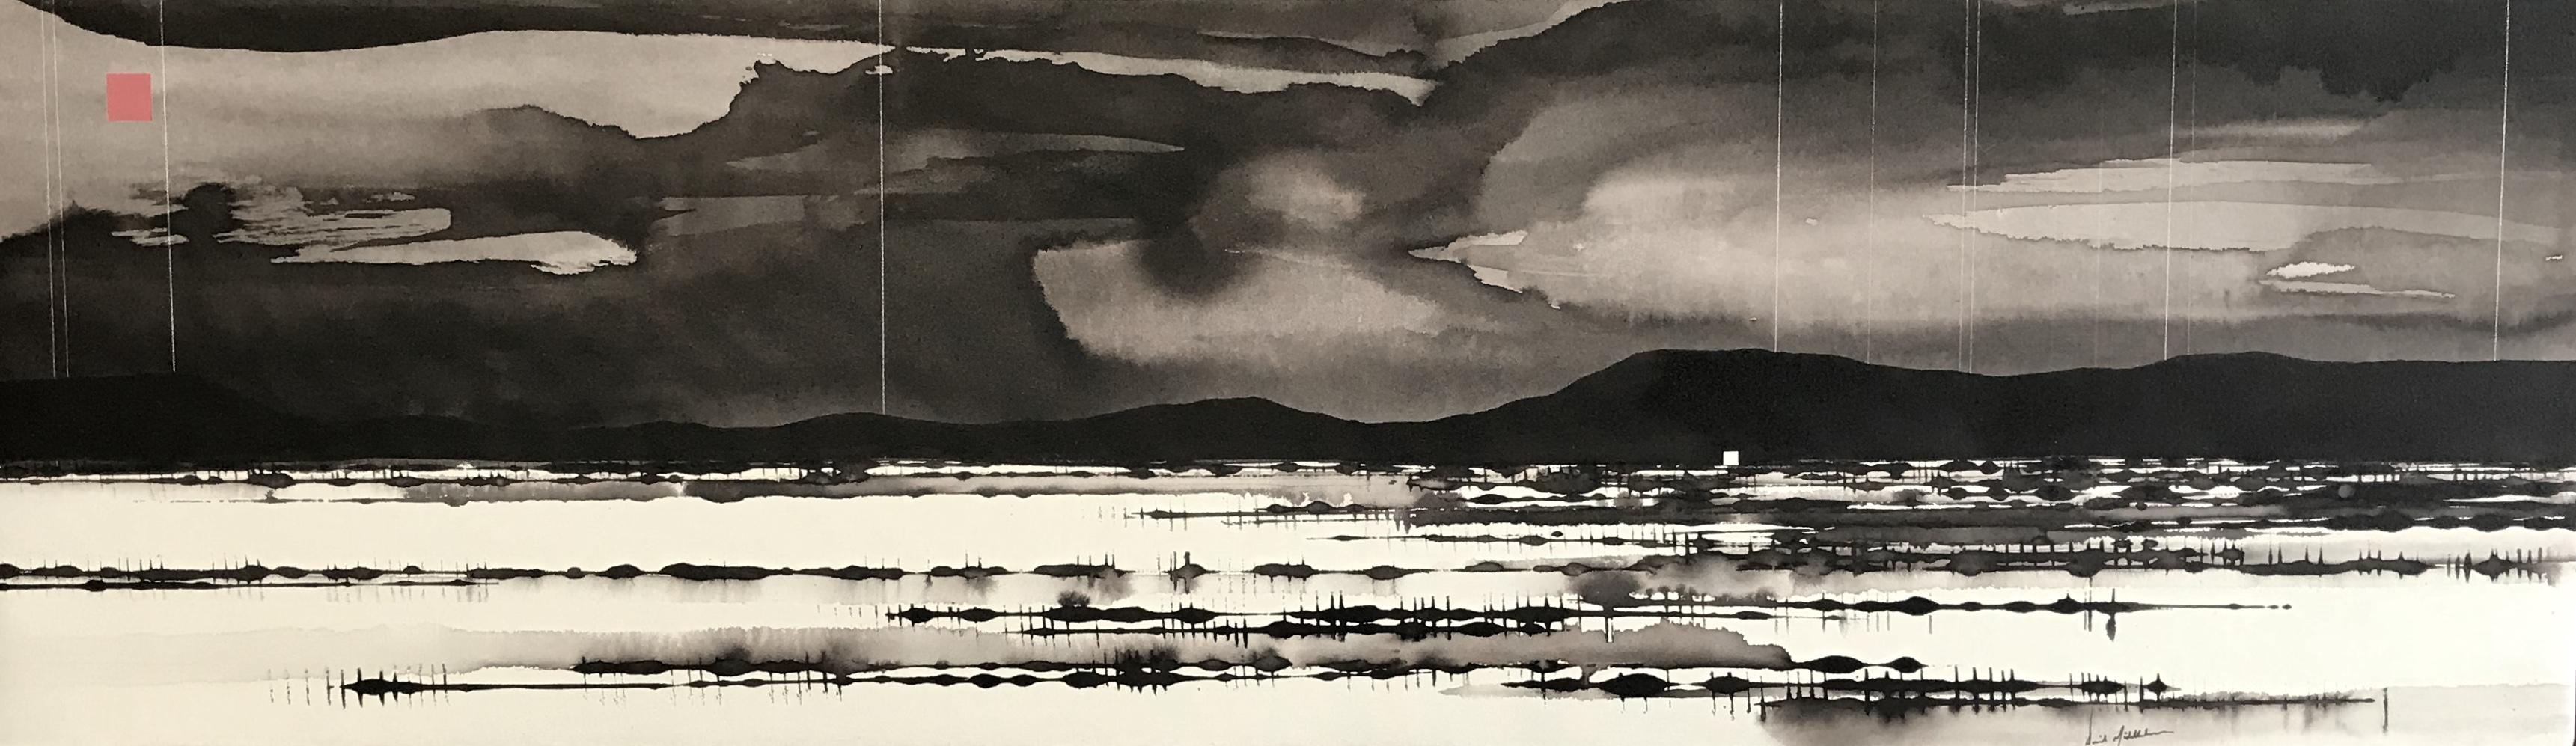 Art Atrium - David Middlebrook - Storm and Salt Lake, ink and acrylic on canvas. 30x100cm